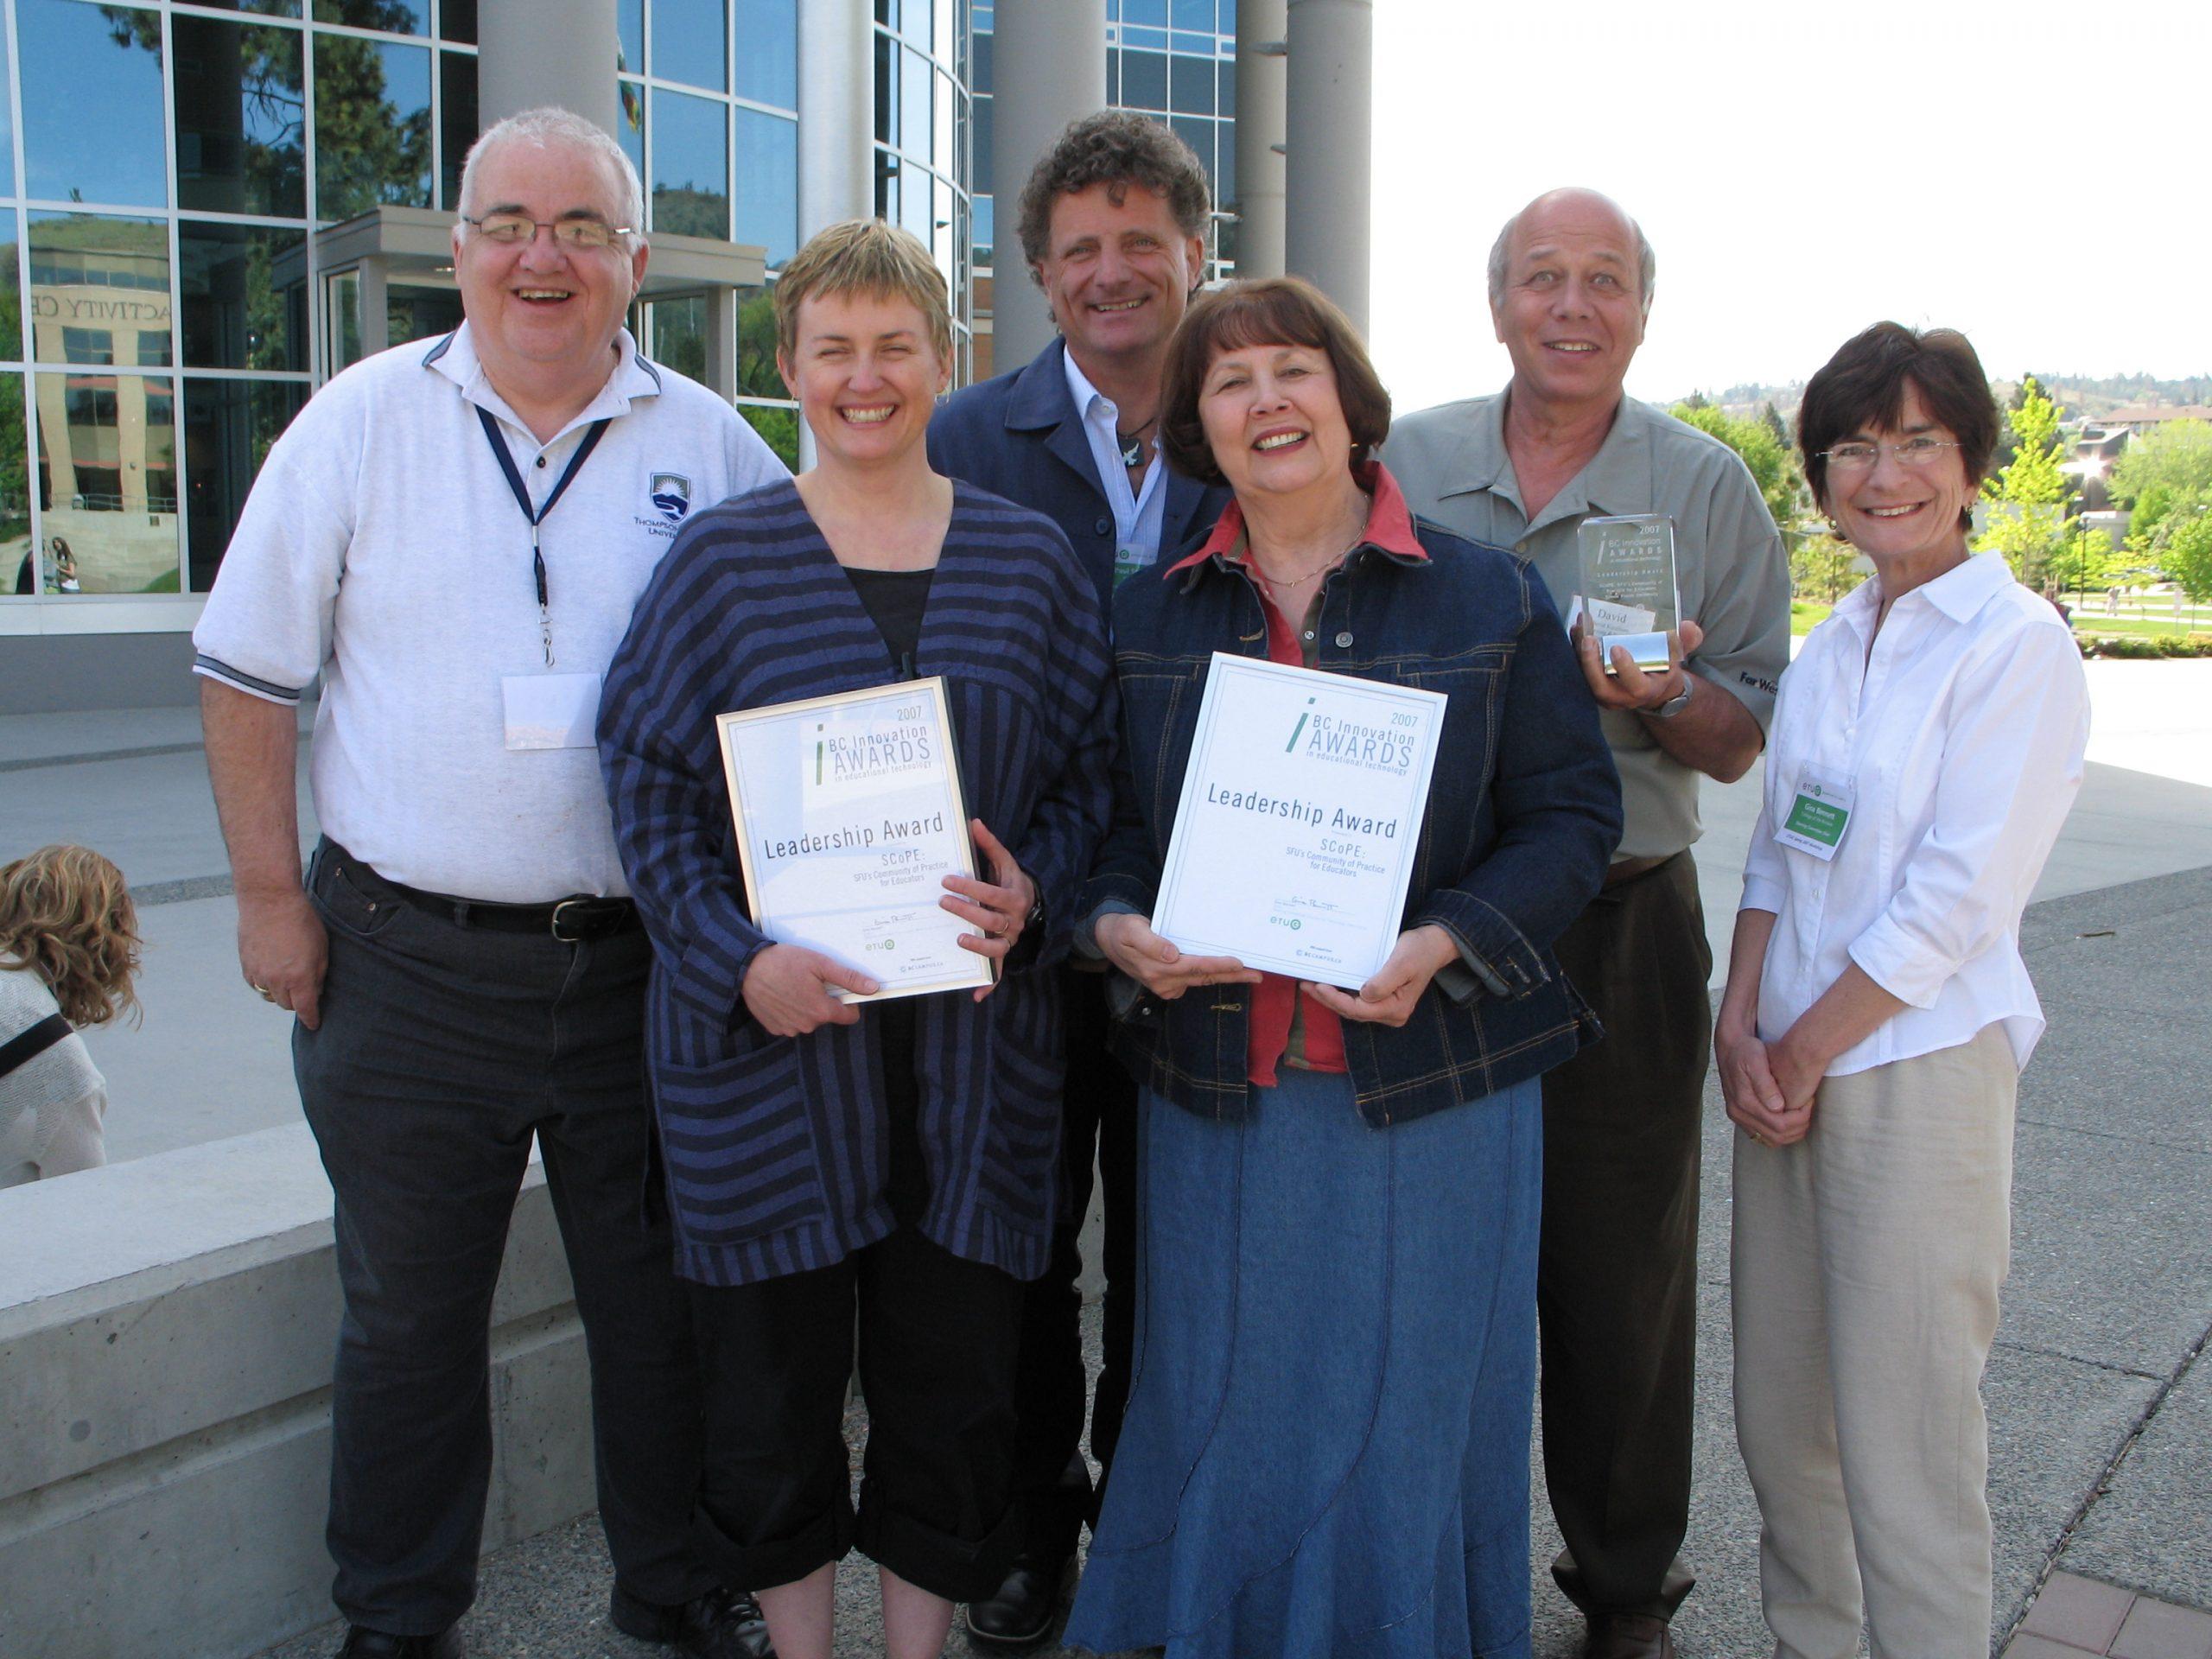 ETUG Spring 2007 Innovation Award Winners